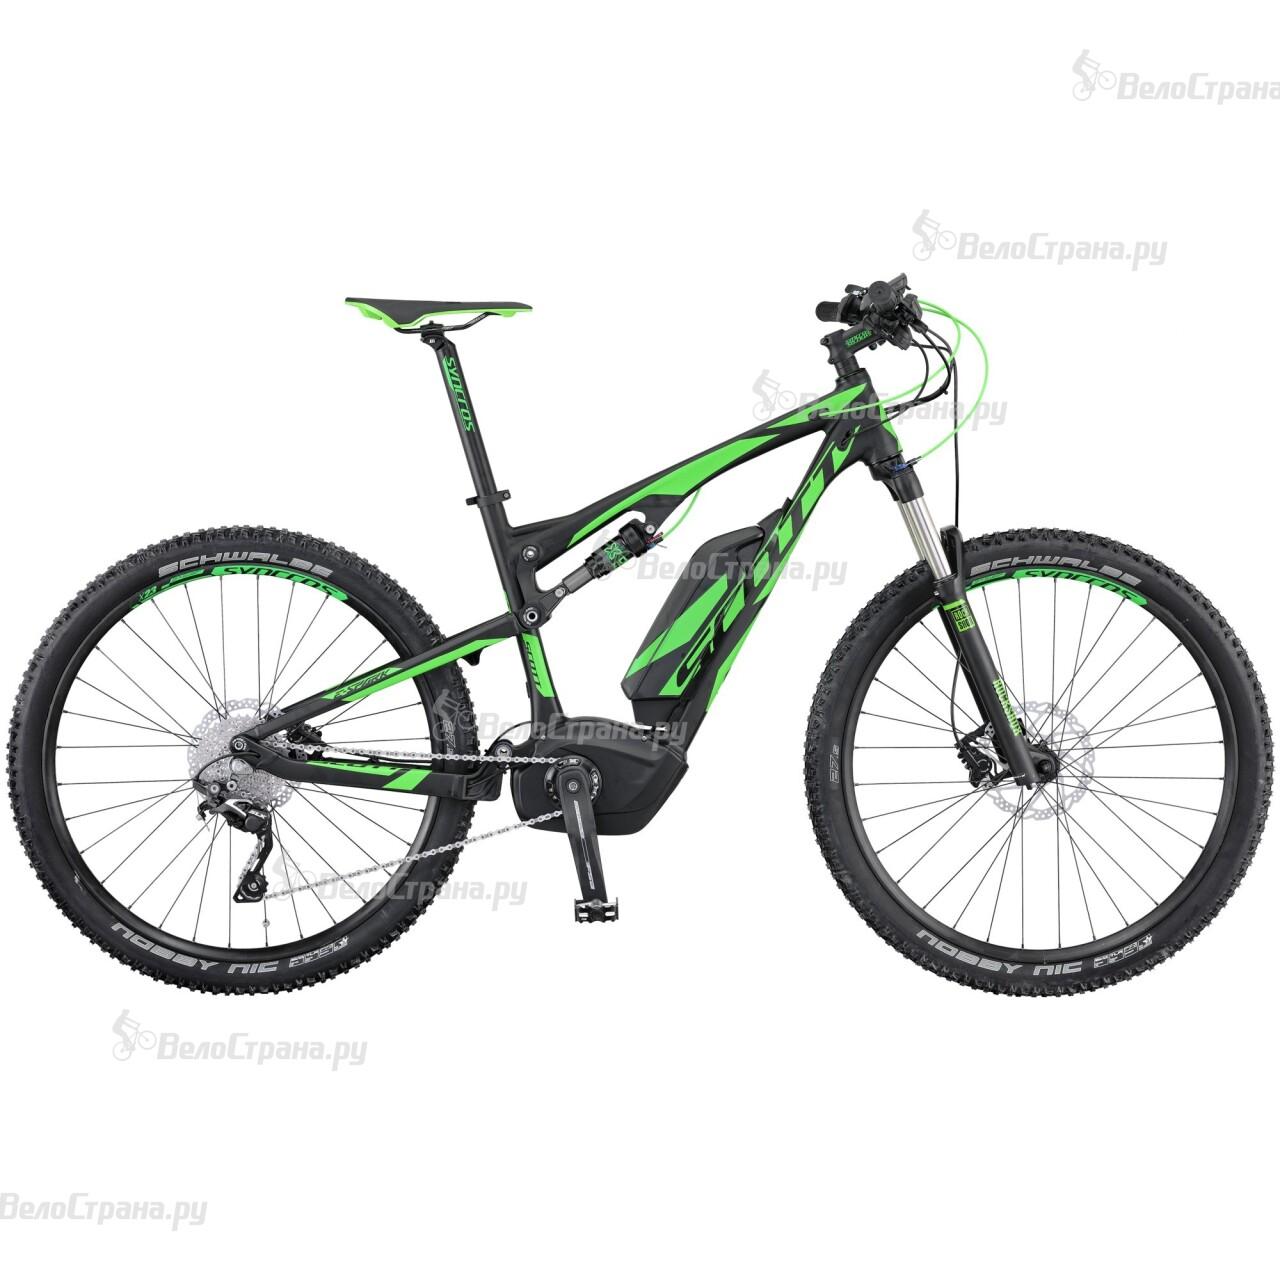 Велосипед Scott E-Spark 720 (2016) велосипед scott spark 720 2015